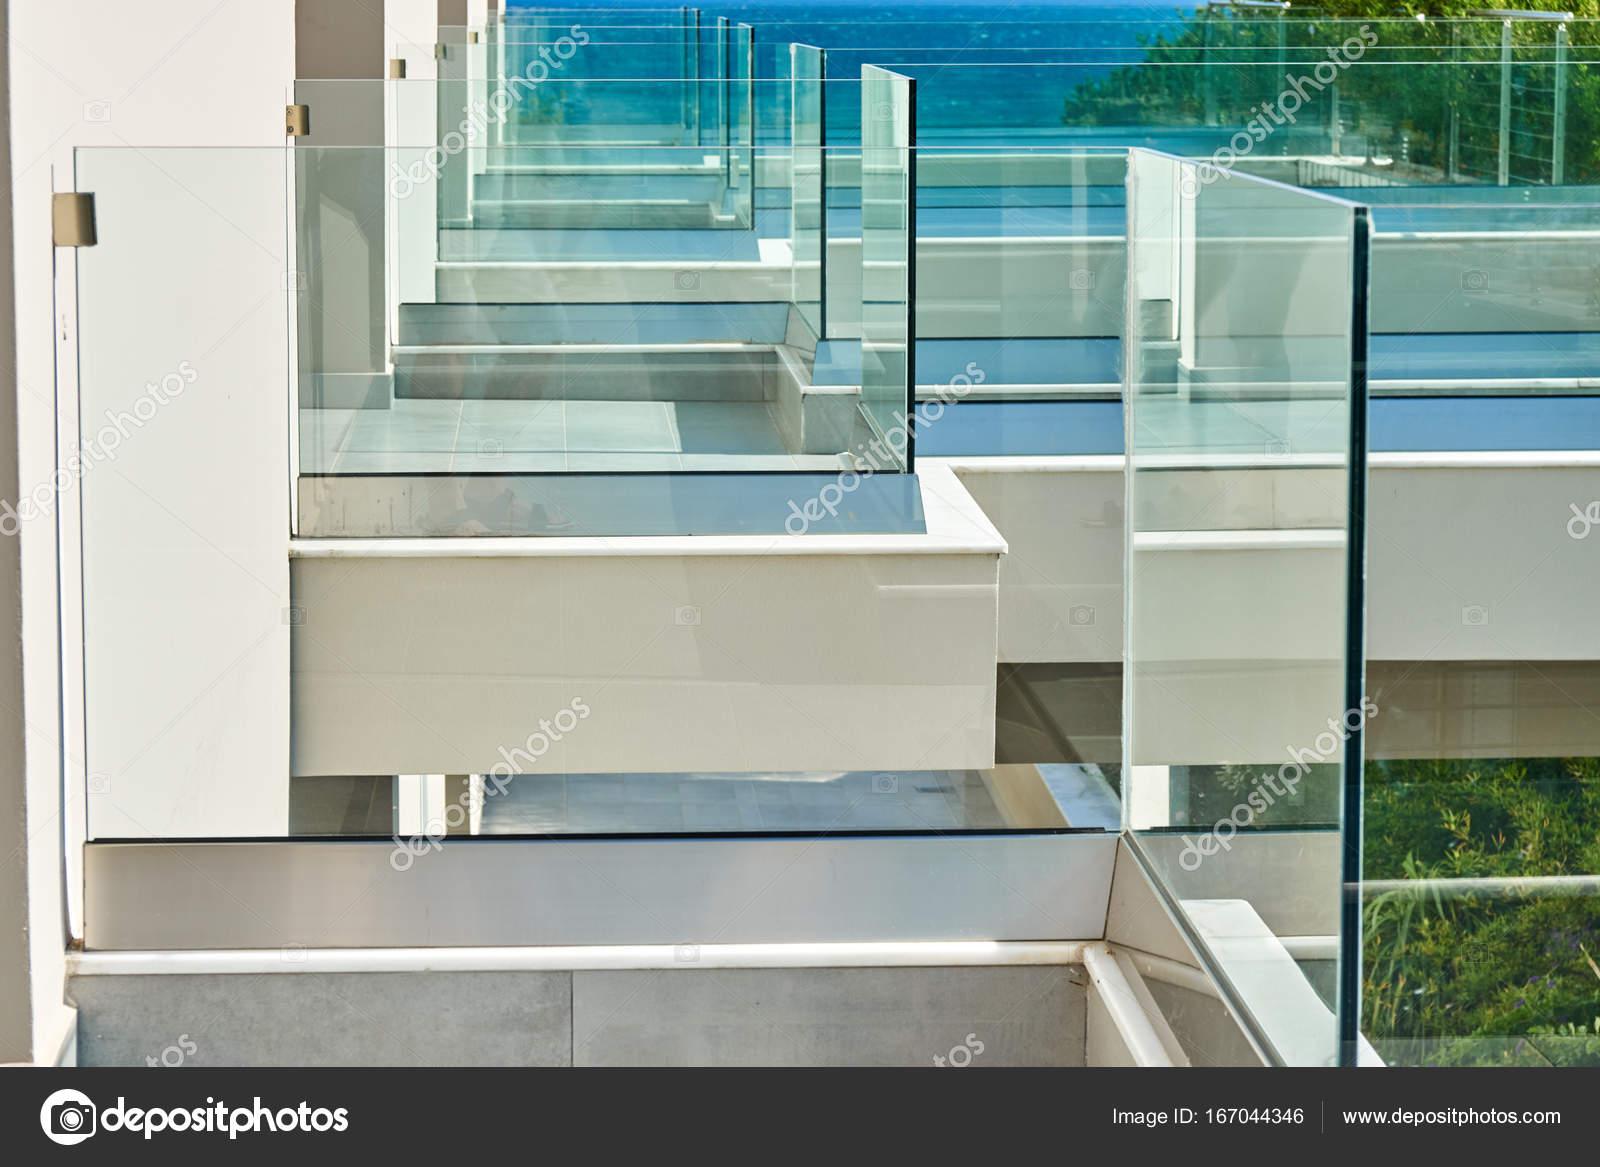 Glas Zaun Im Hotel Am Meer Stockfoto C Timltv 167044346